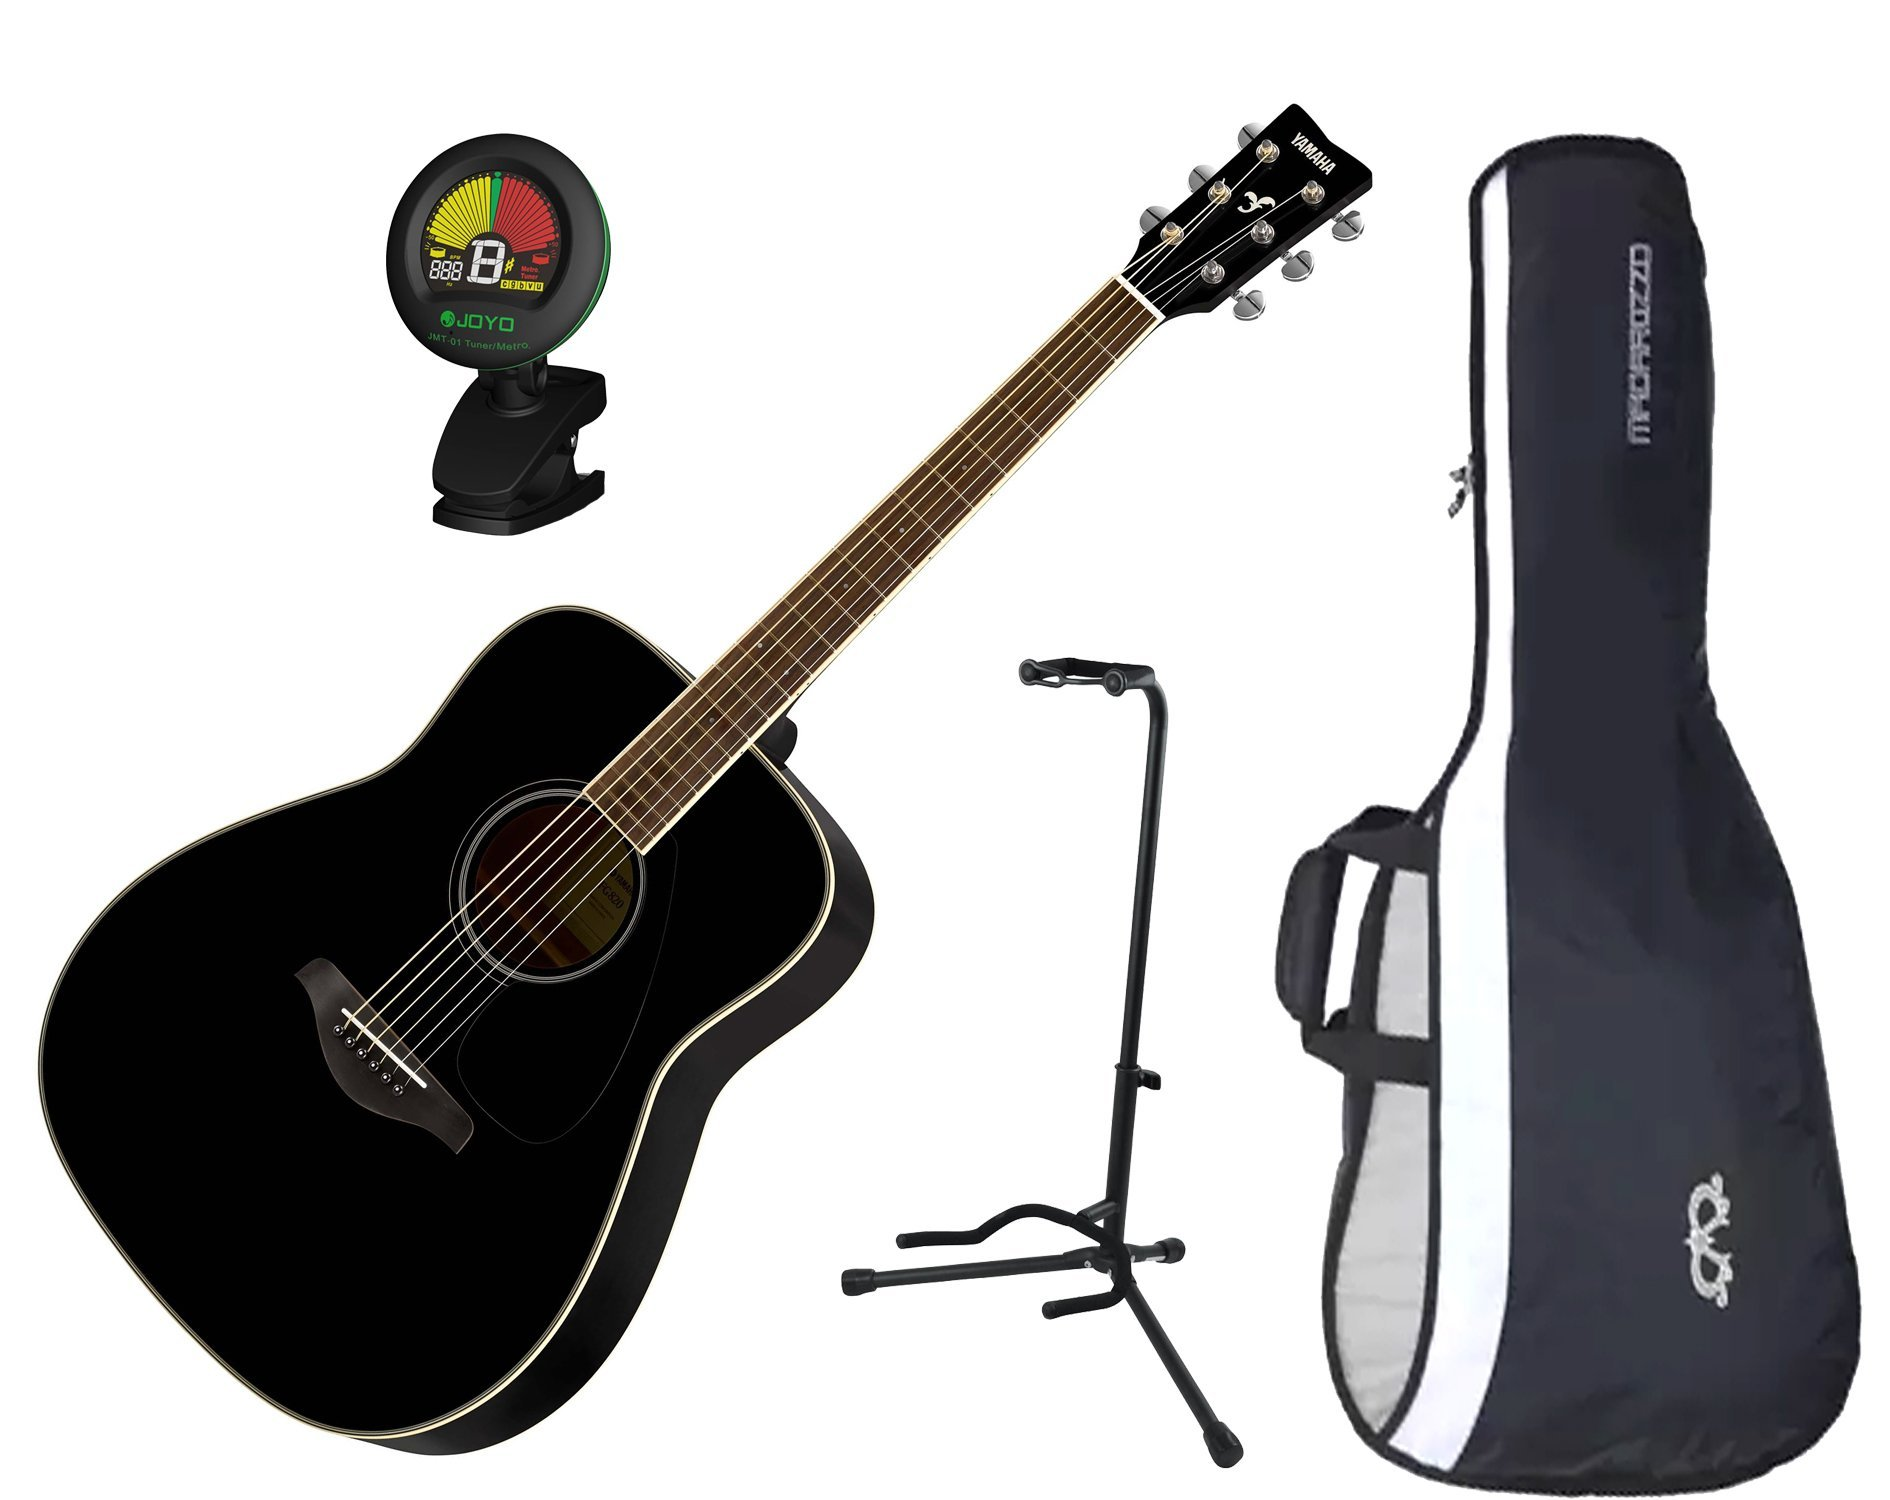 Yamaha FG820BL Solid Sitka Spruce Top Folk Acoustic Guitar Black w/ Gig Bag, Stand, and Tuner